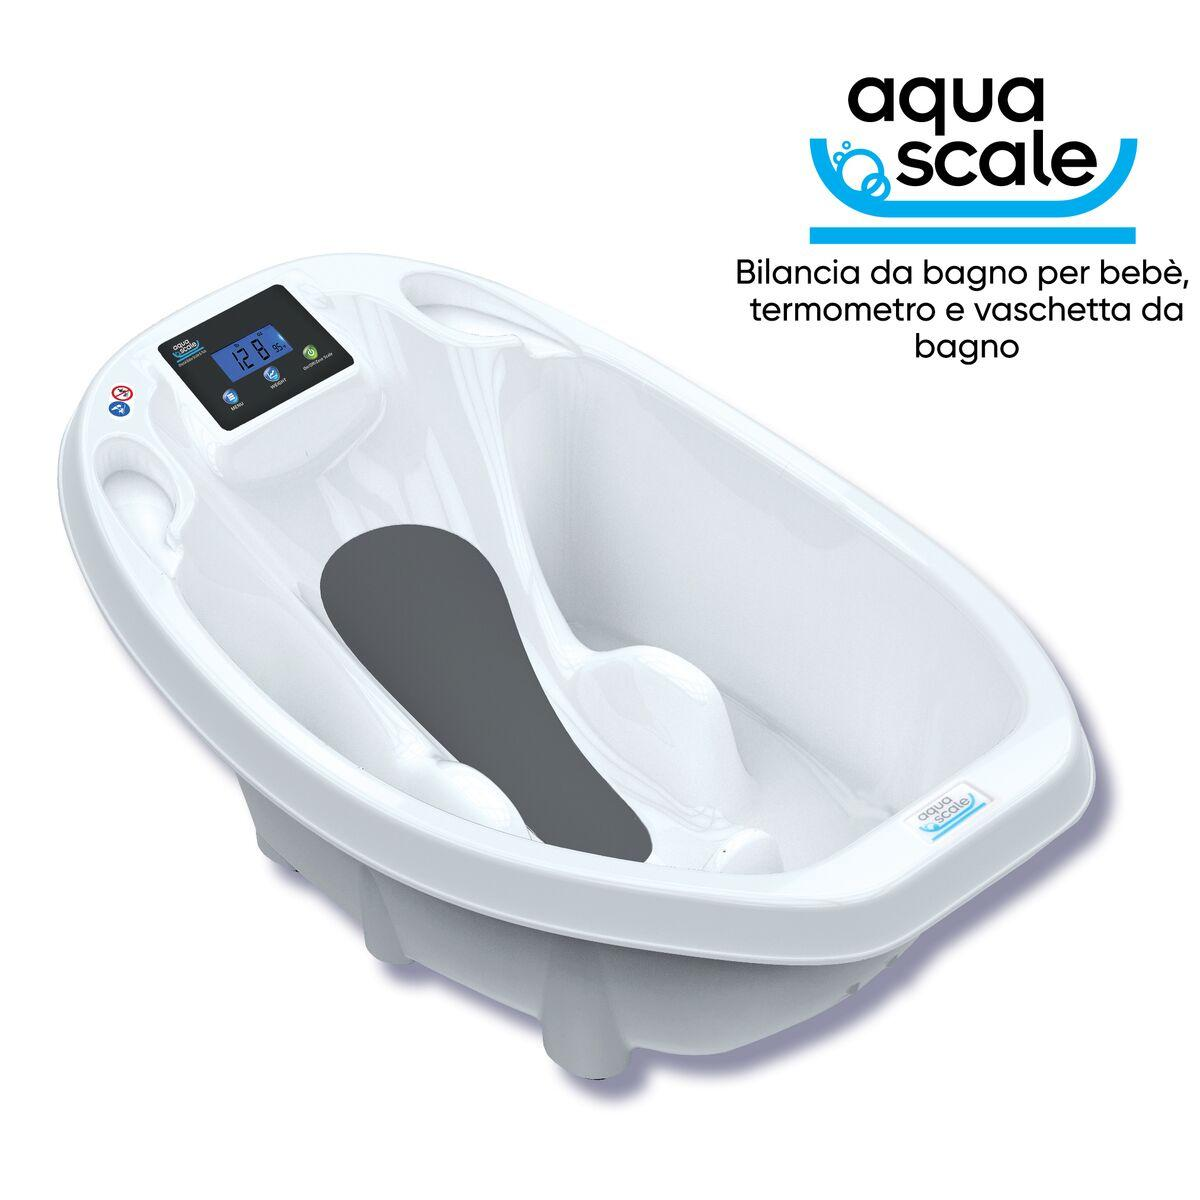 vaschetta da bagno per bambini